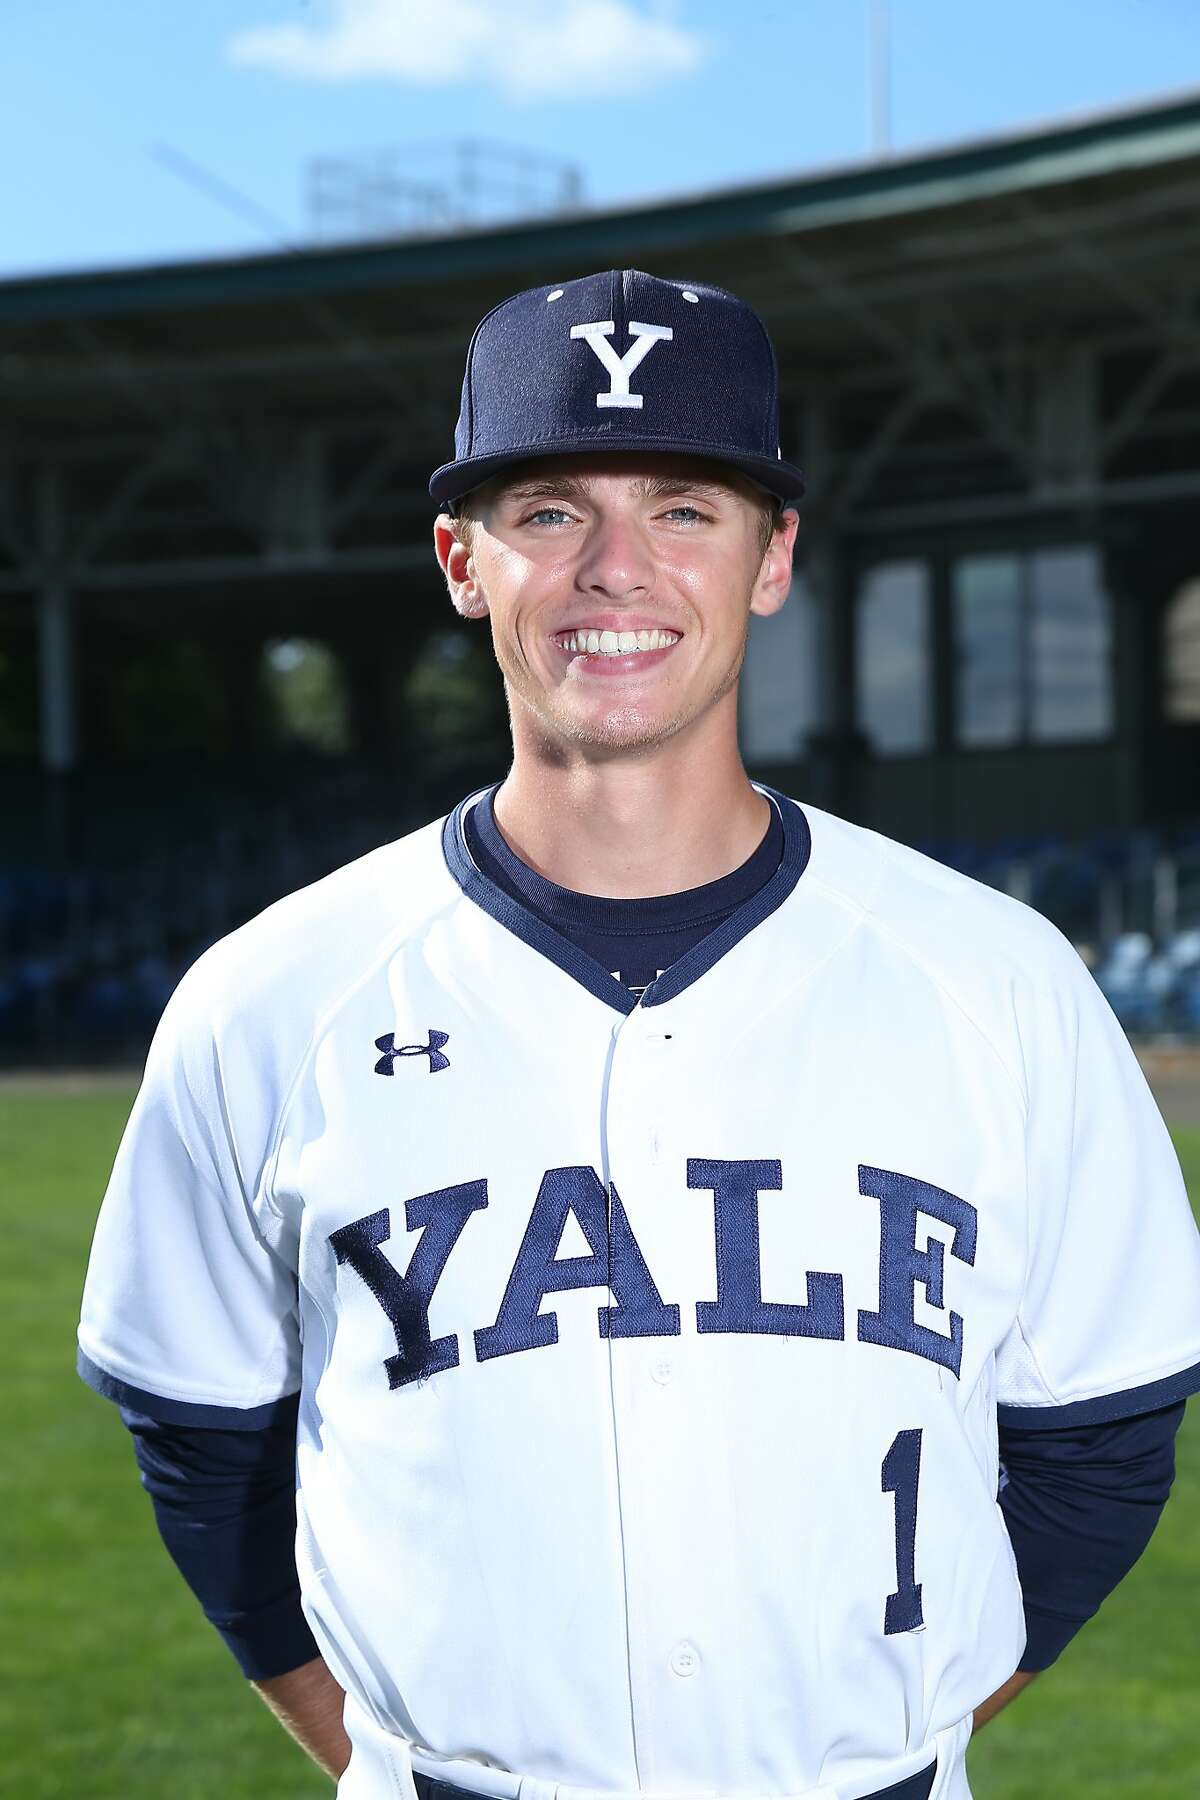 Yale baseball standout shortstop Simon Whiteman was a Rhodes Scholars nominee